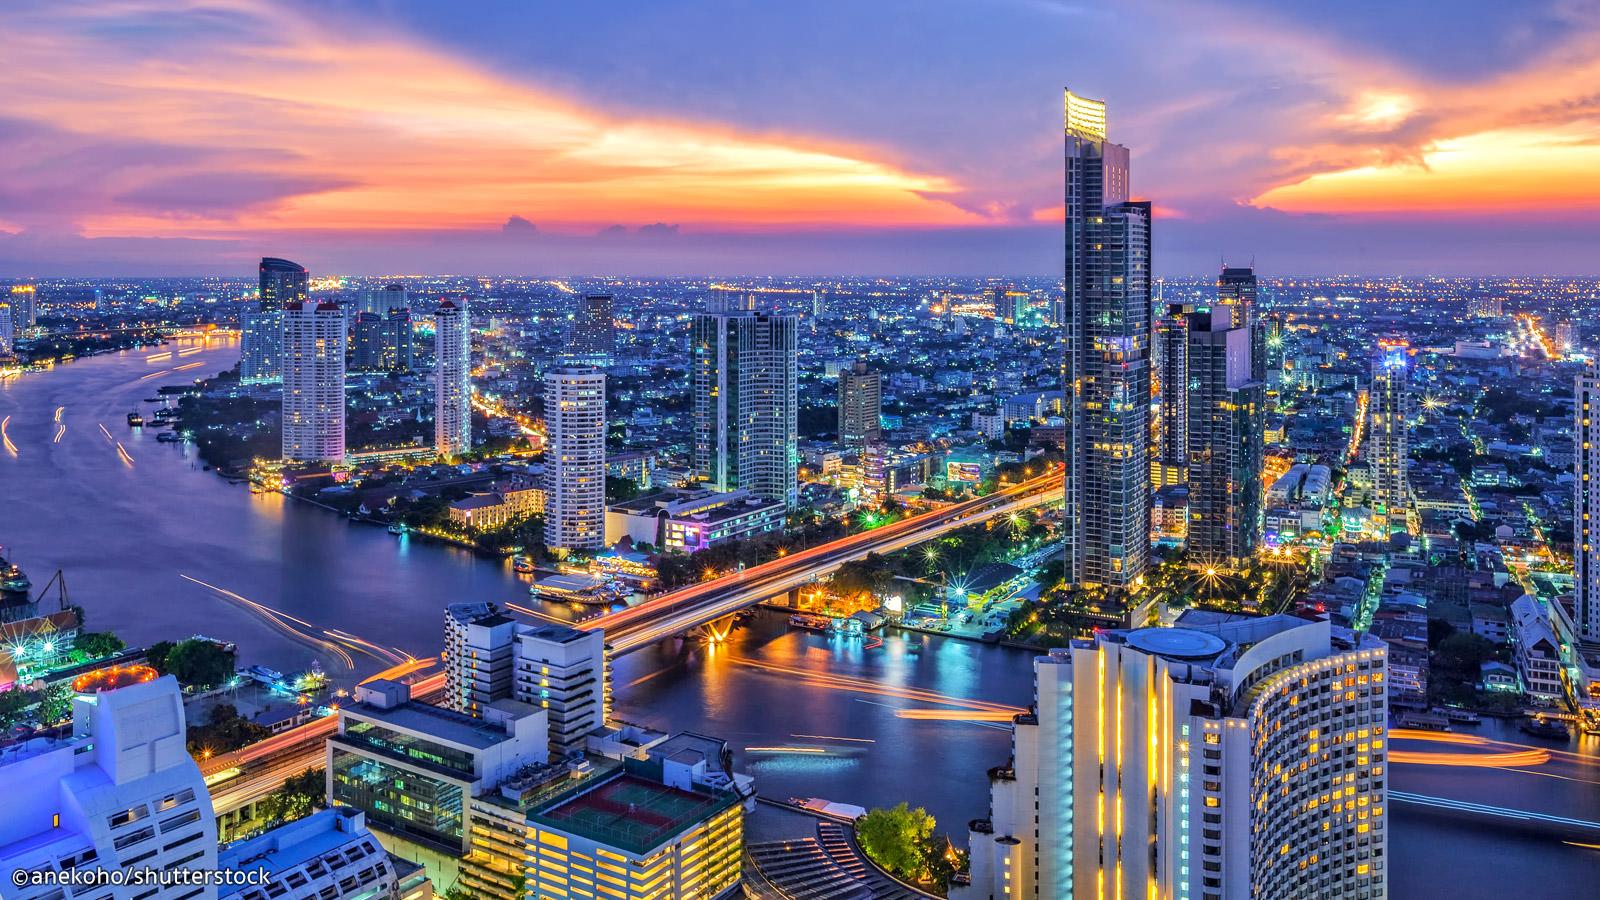 A/R Paris (CDG) <> Bangkok (BKK) en vol direct avec Thaï Airways du 09/03/20 au 23/03/20